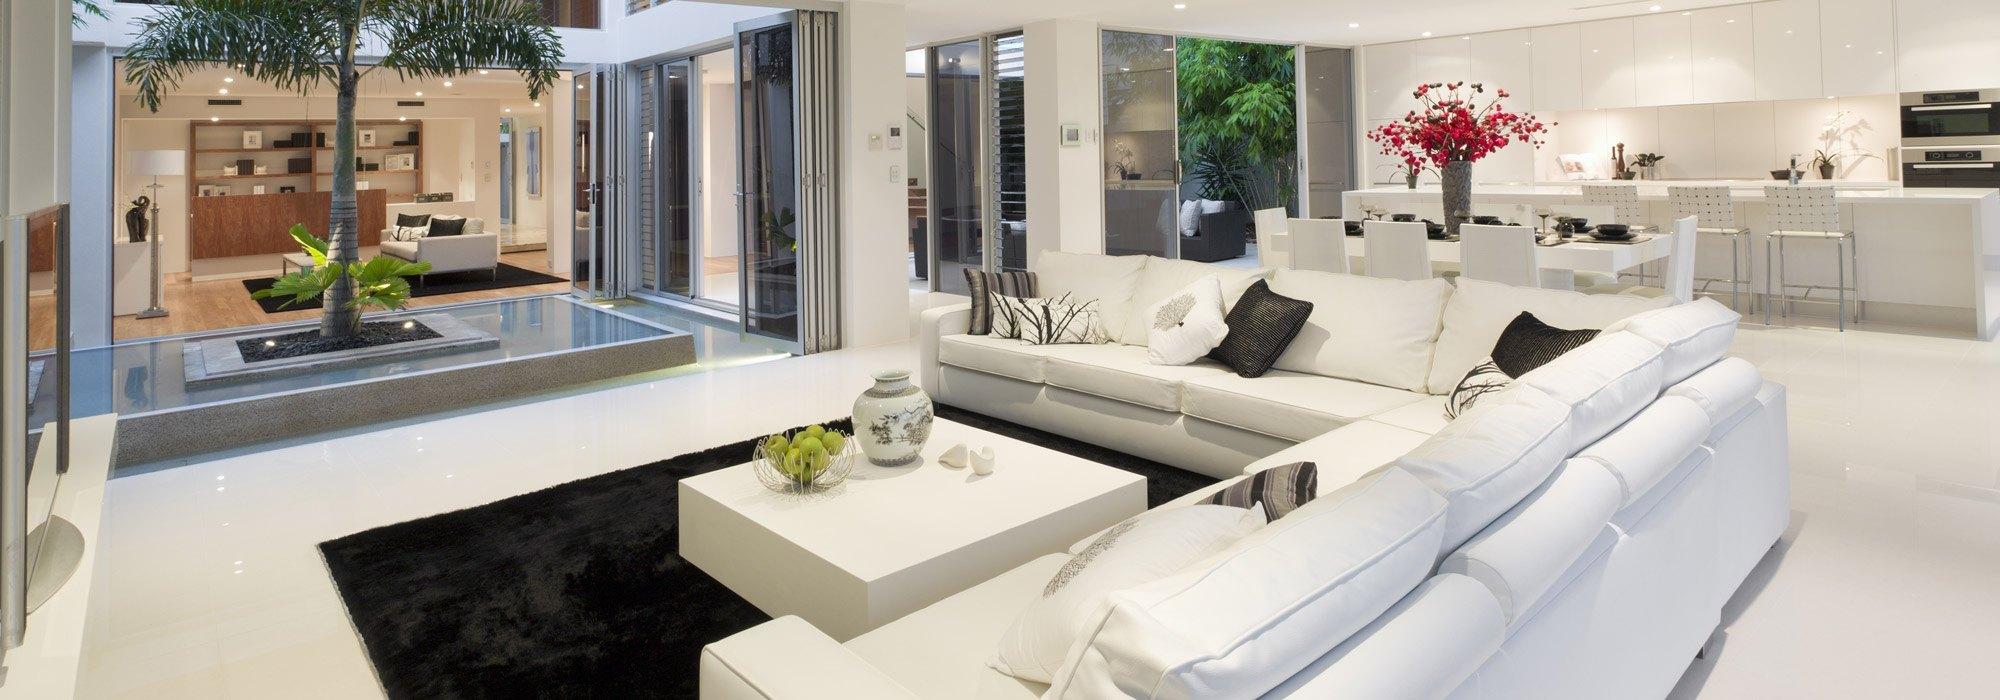 Asesoramiento para tu nueva vivienda